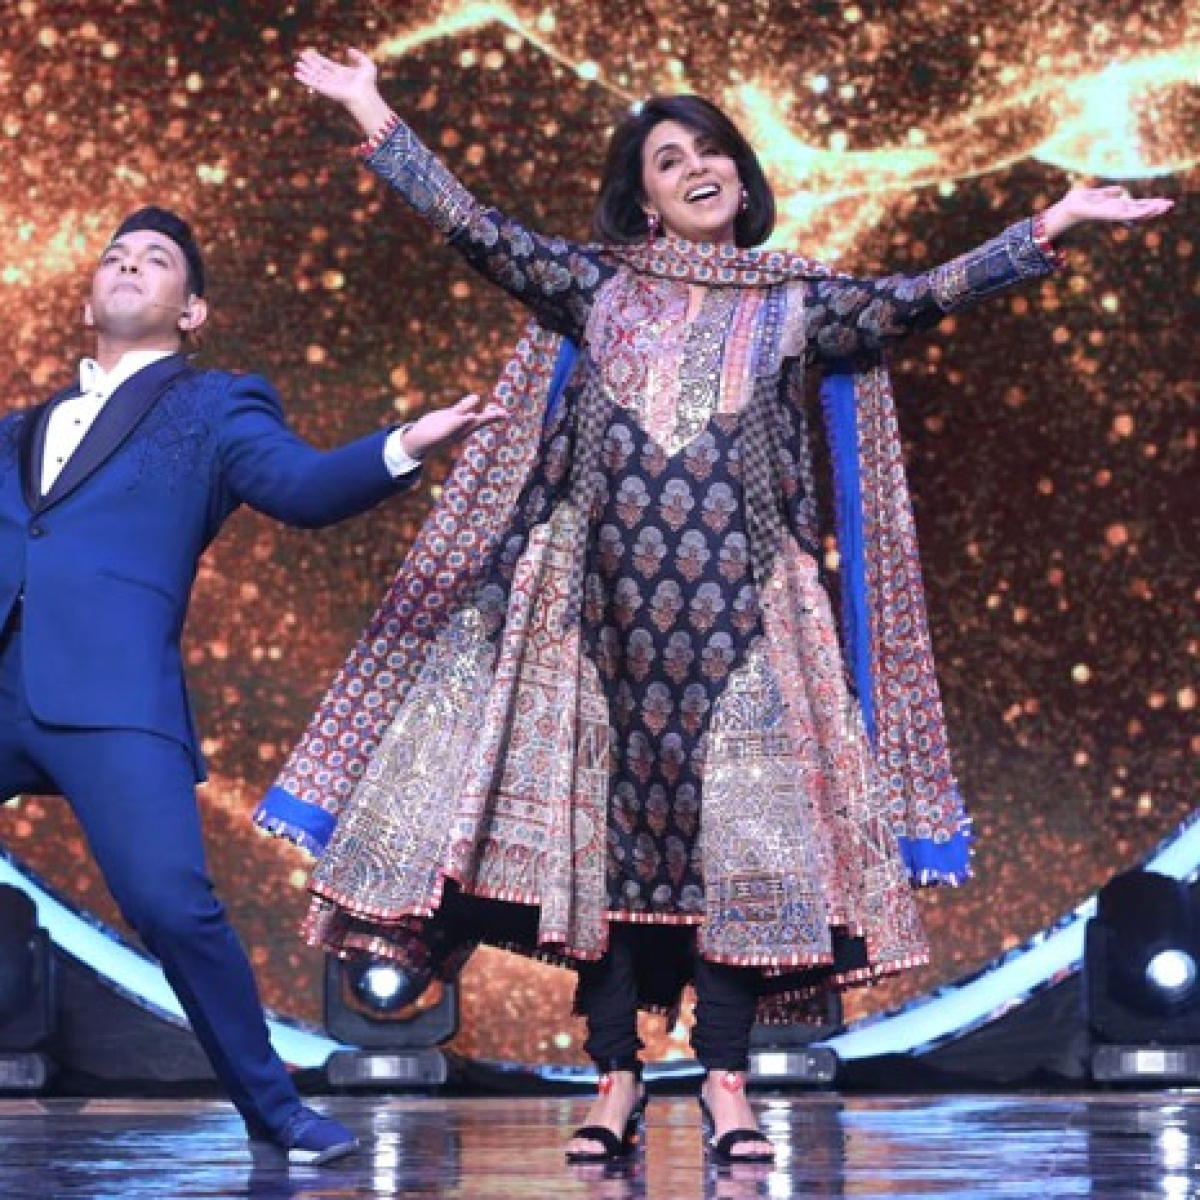 'I will not get sad': Neetu Kapoor remembers Rishi Kapoor, dances to 'Khullam Khulla Pyar Karenge' - watch video